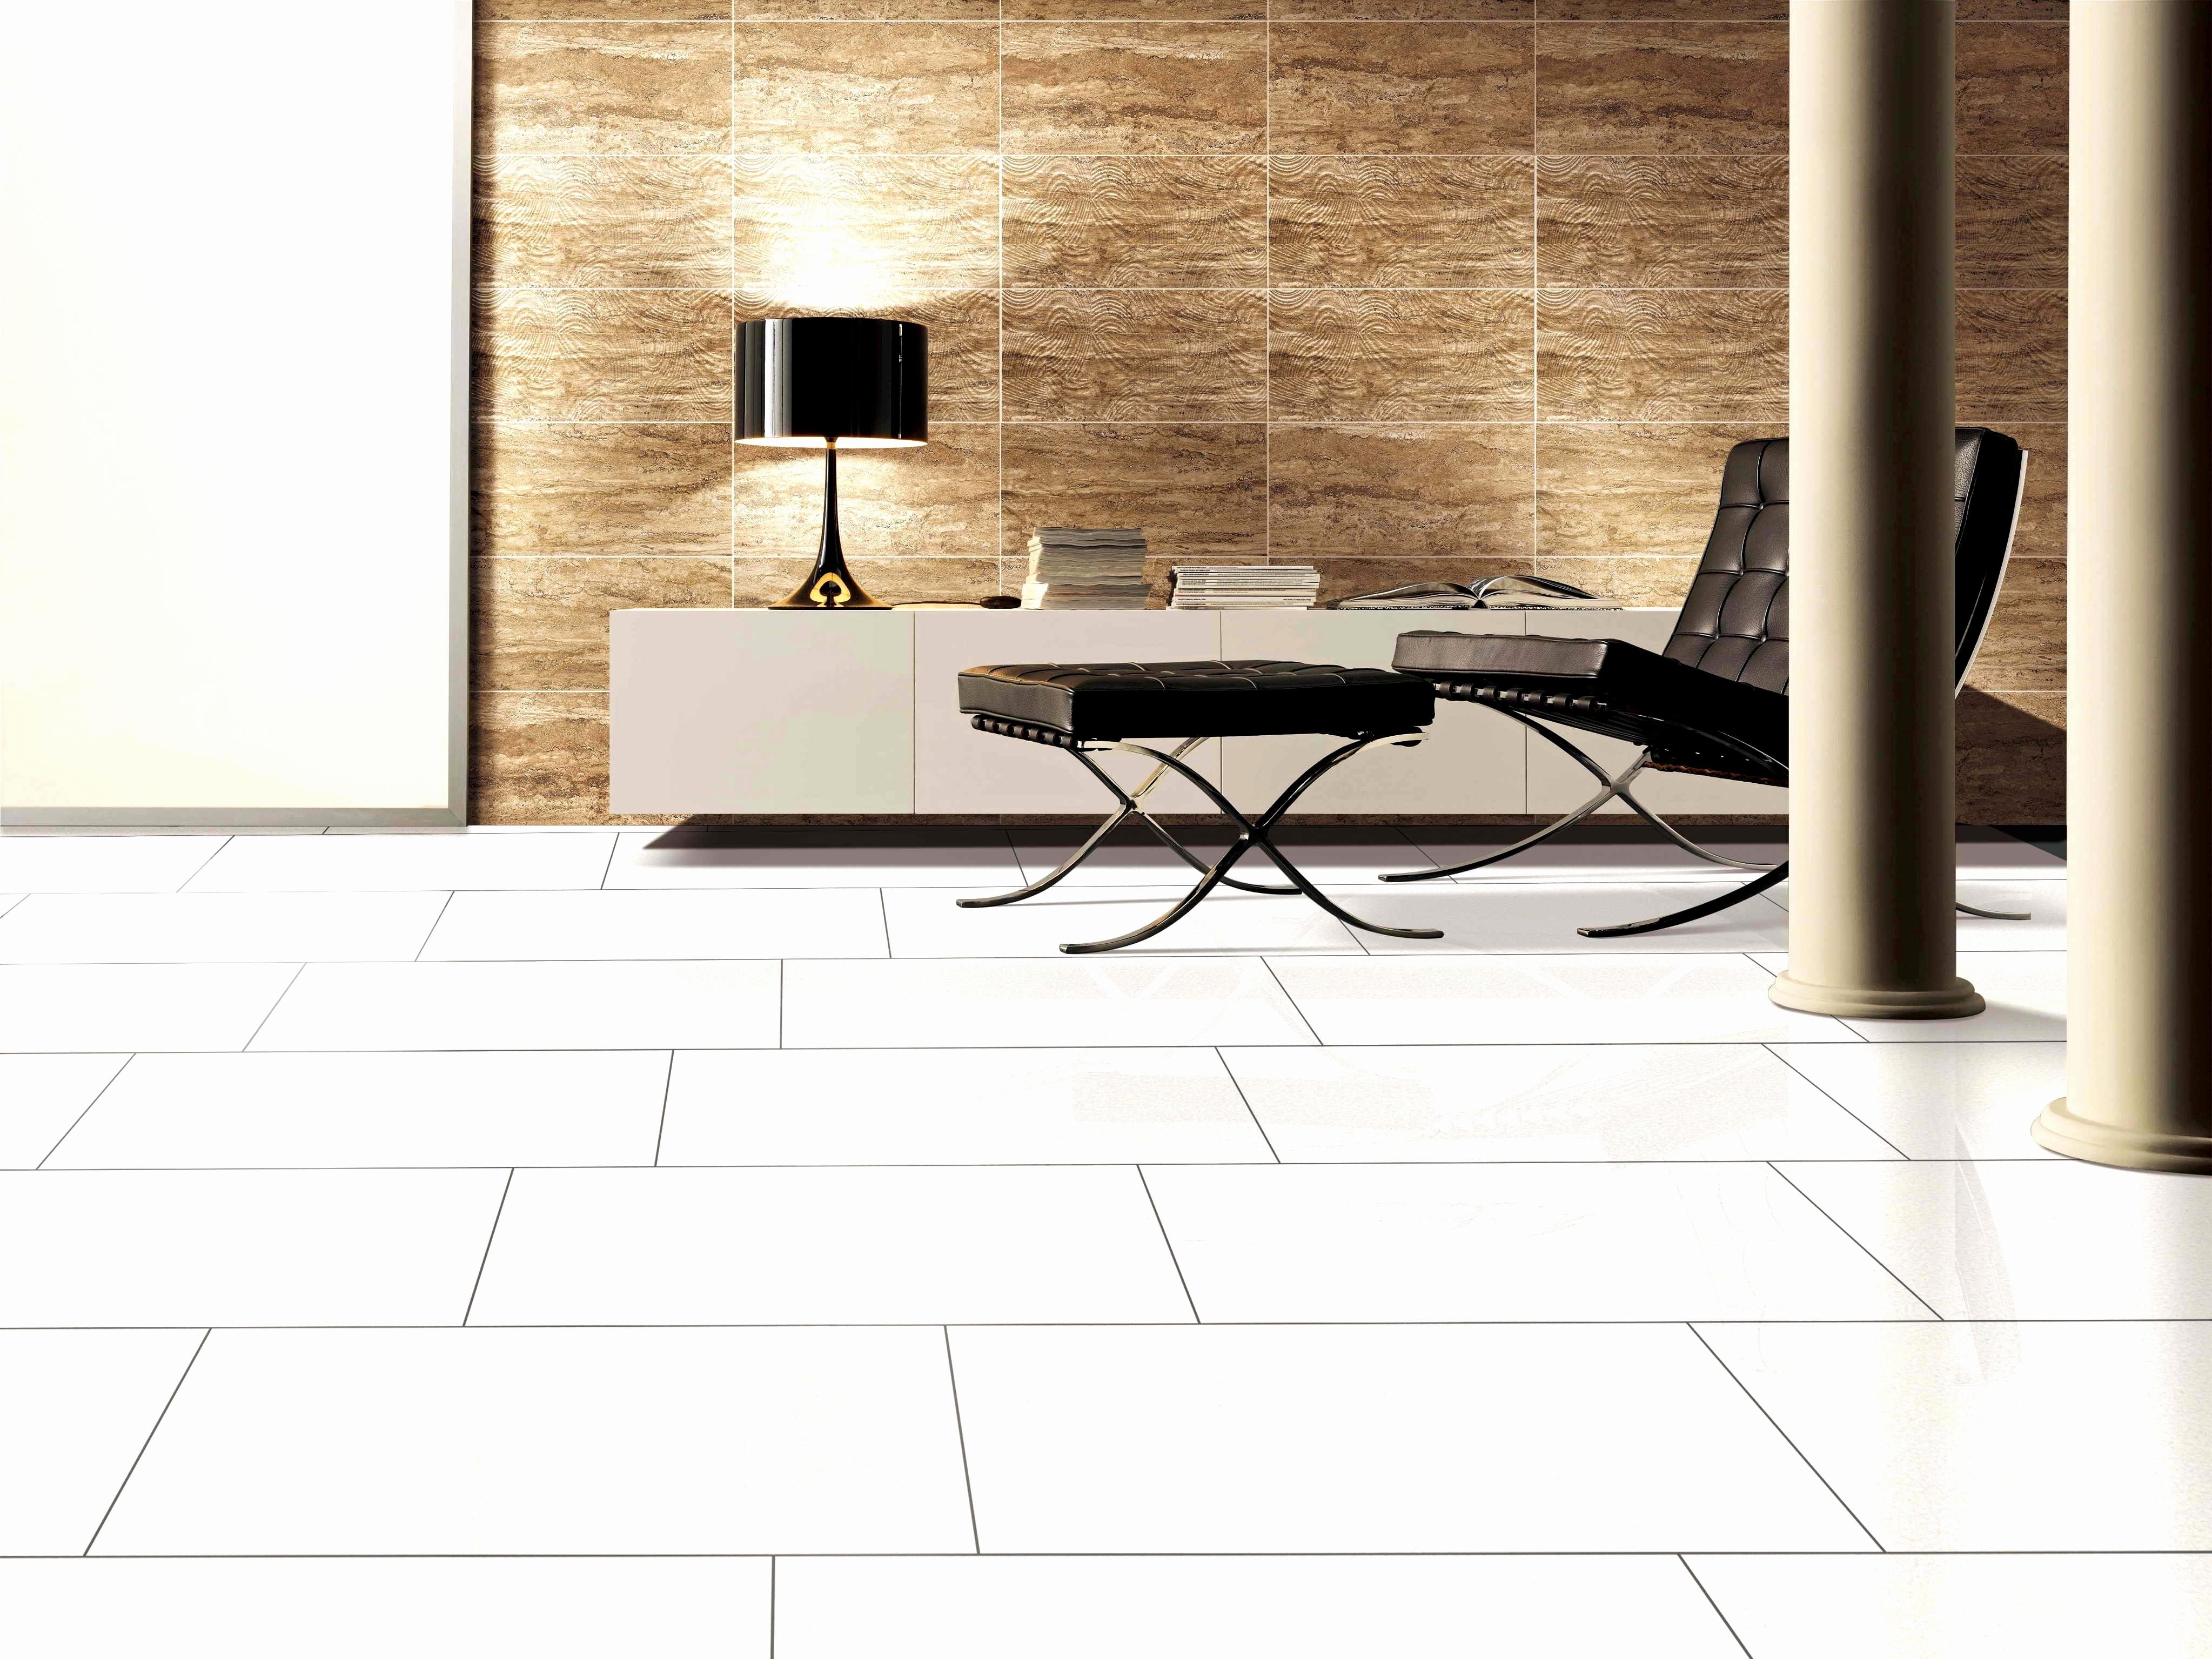 bona x hardwood floor cleaner of all about floors luxury new new tile floor heating lovely bmw e87 with all about floors luxury new new tile floor heating lovely bmw e87 1er 04 07 120d